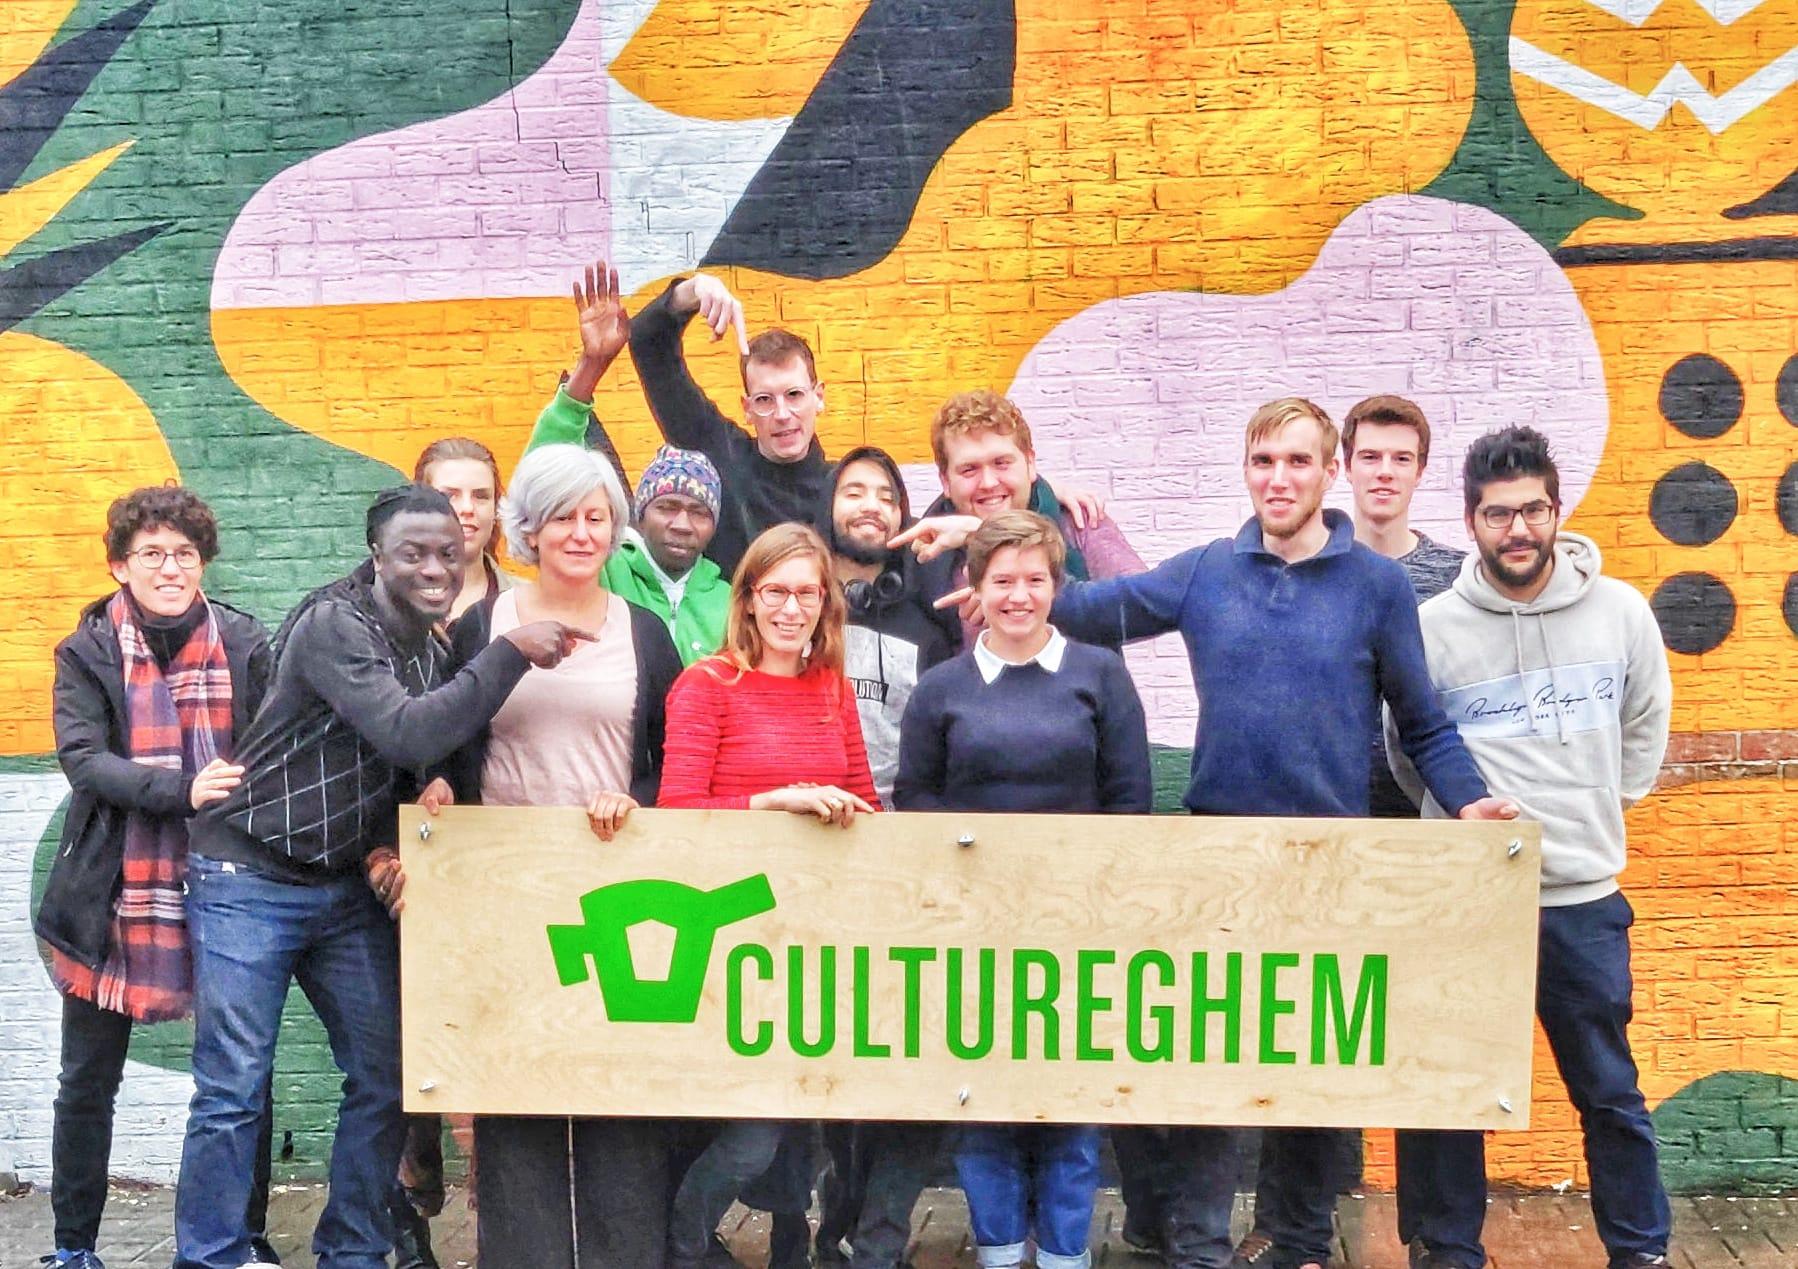 Cultureghem 2.0